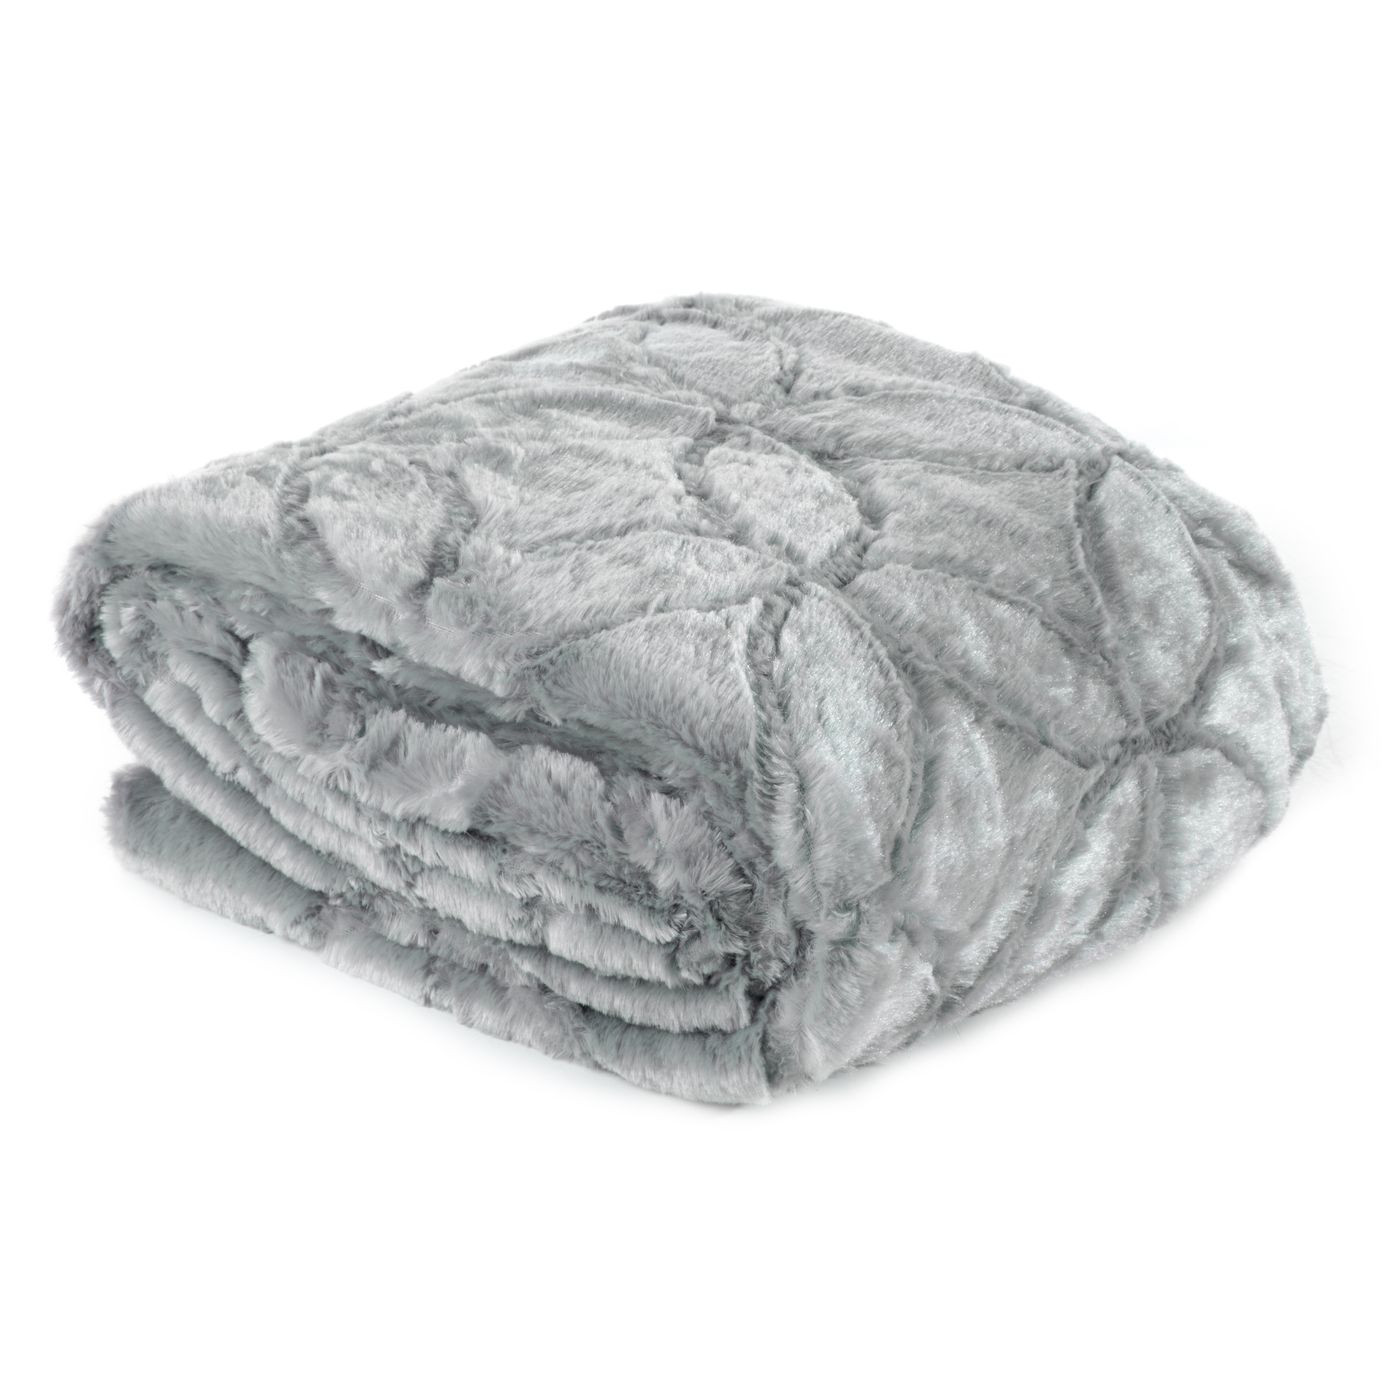 Narzuta futerko na fotel srebrny szary 70x160 cm